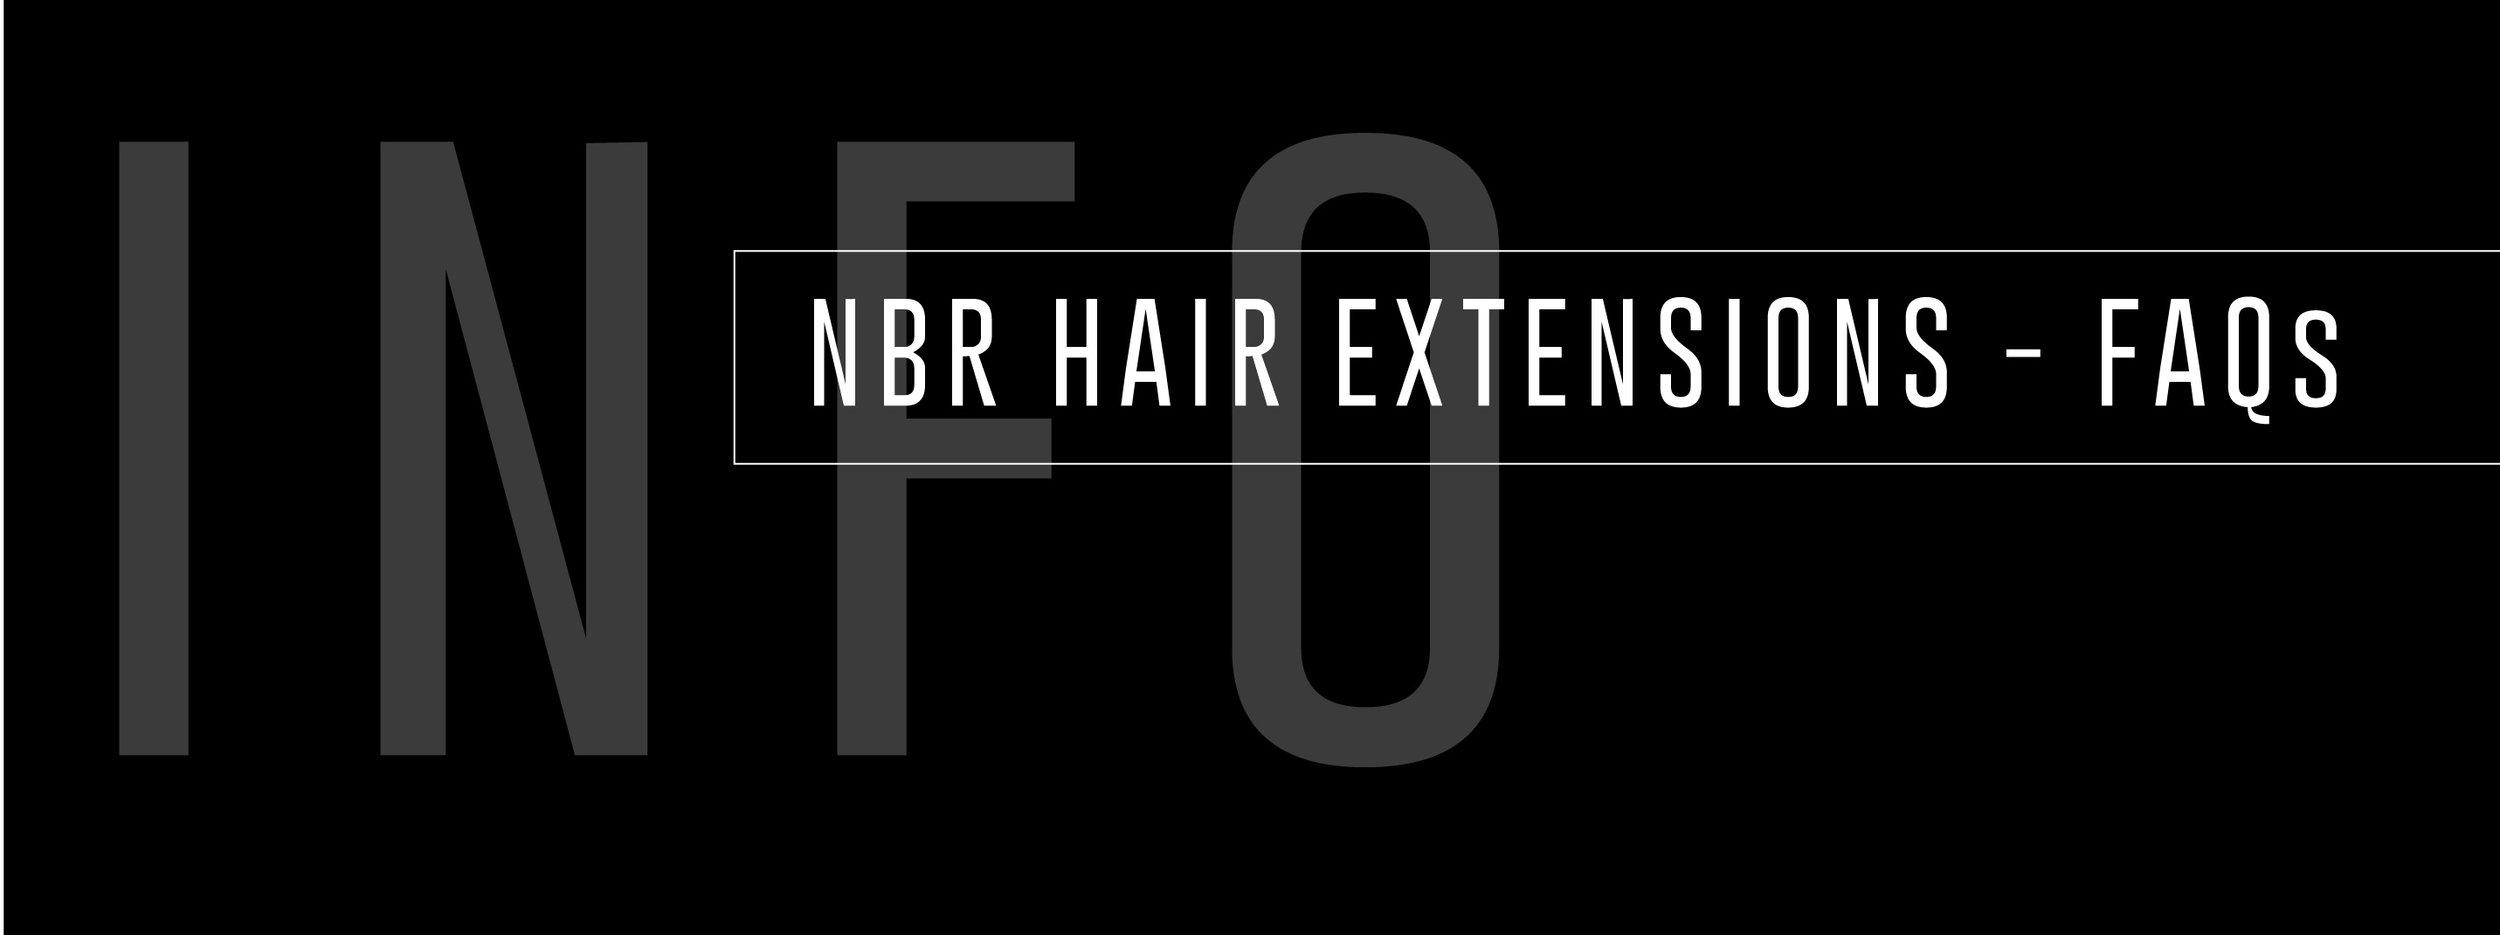 NBR FAQ Banner-01.jpg